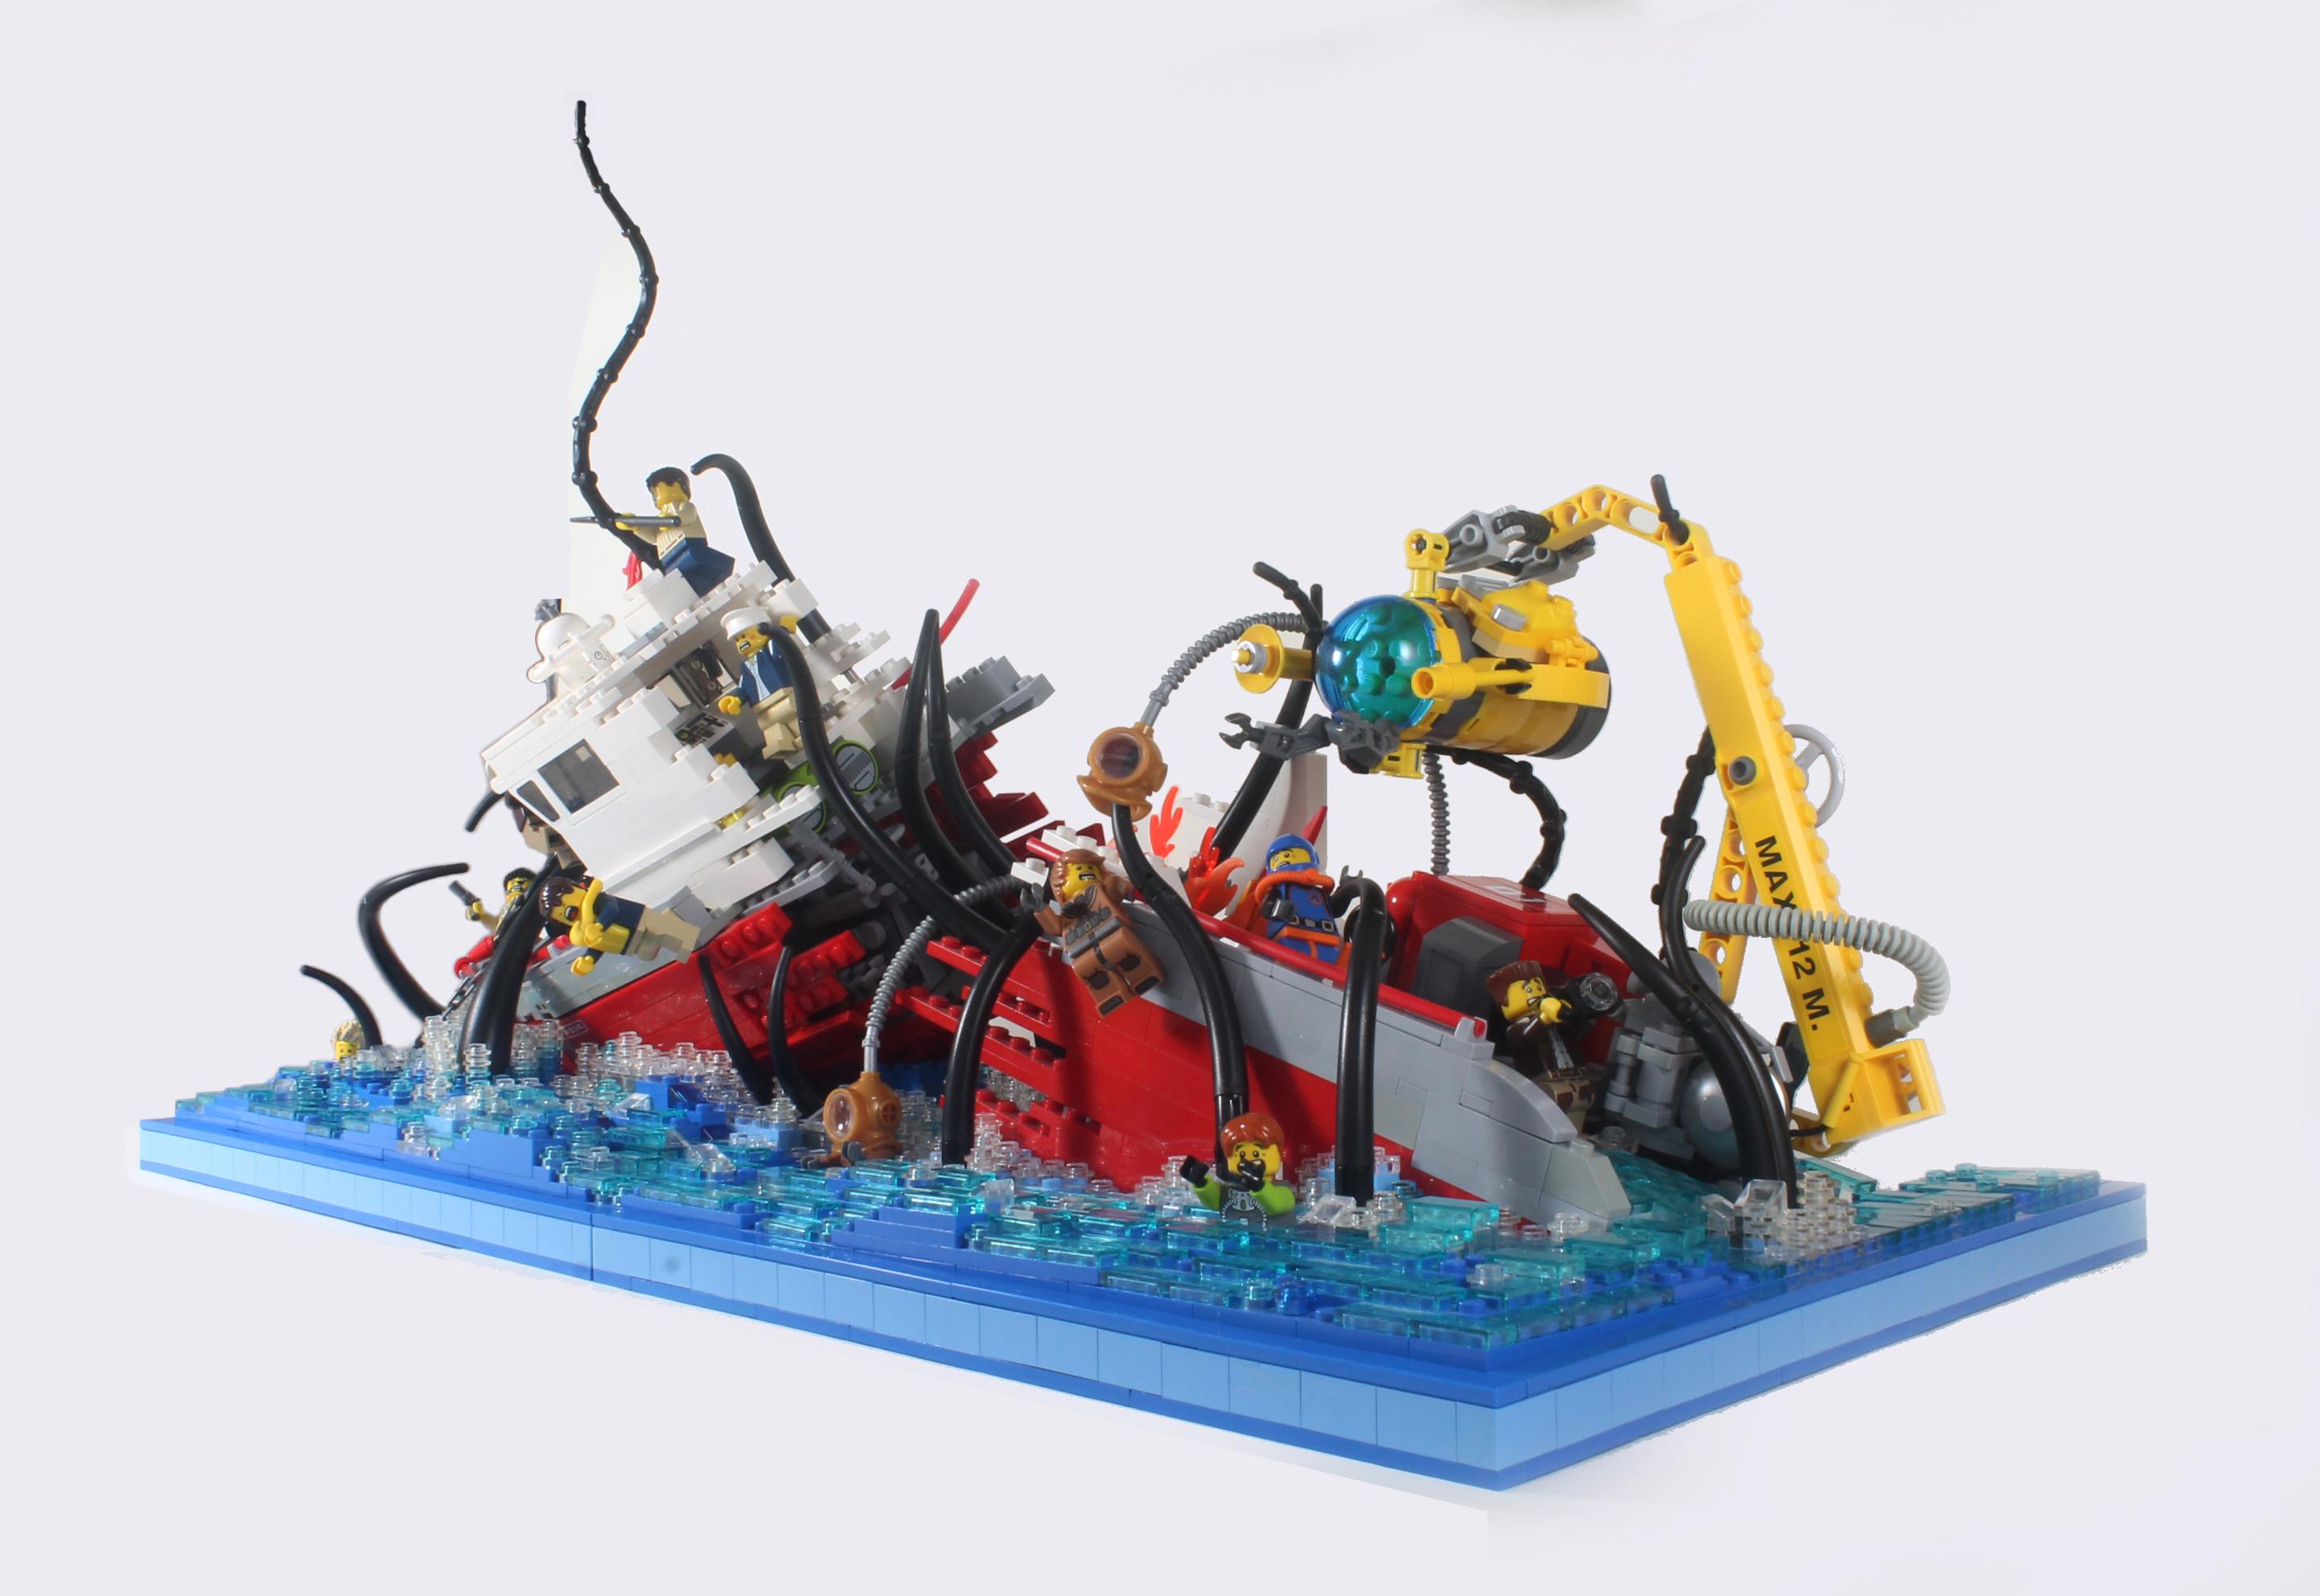 wallpaper : ship, boat, sea, wreck, lego, toy, submarine